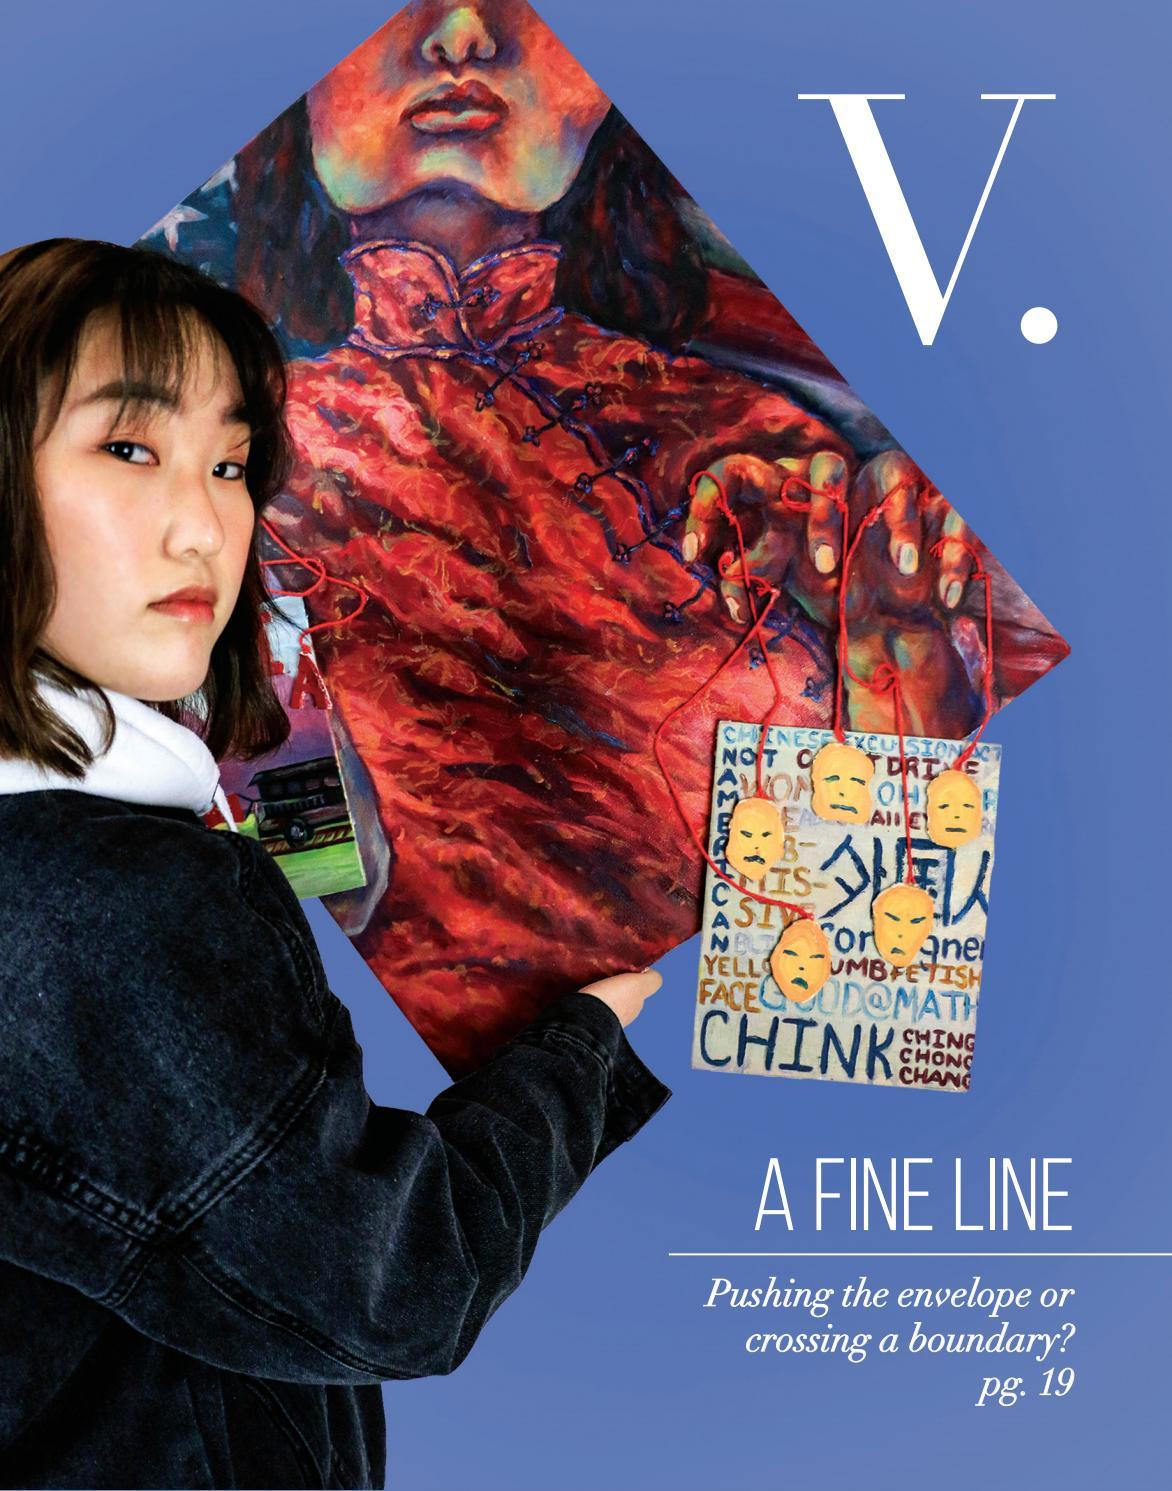 5fea32fce470 Verde Volume 20 Issue 4 by Verde Magazine - issuu